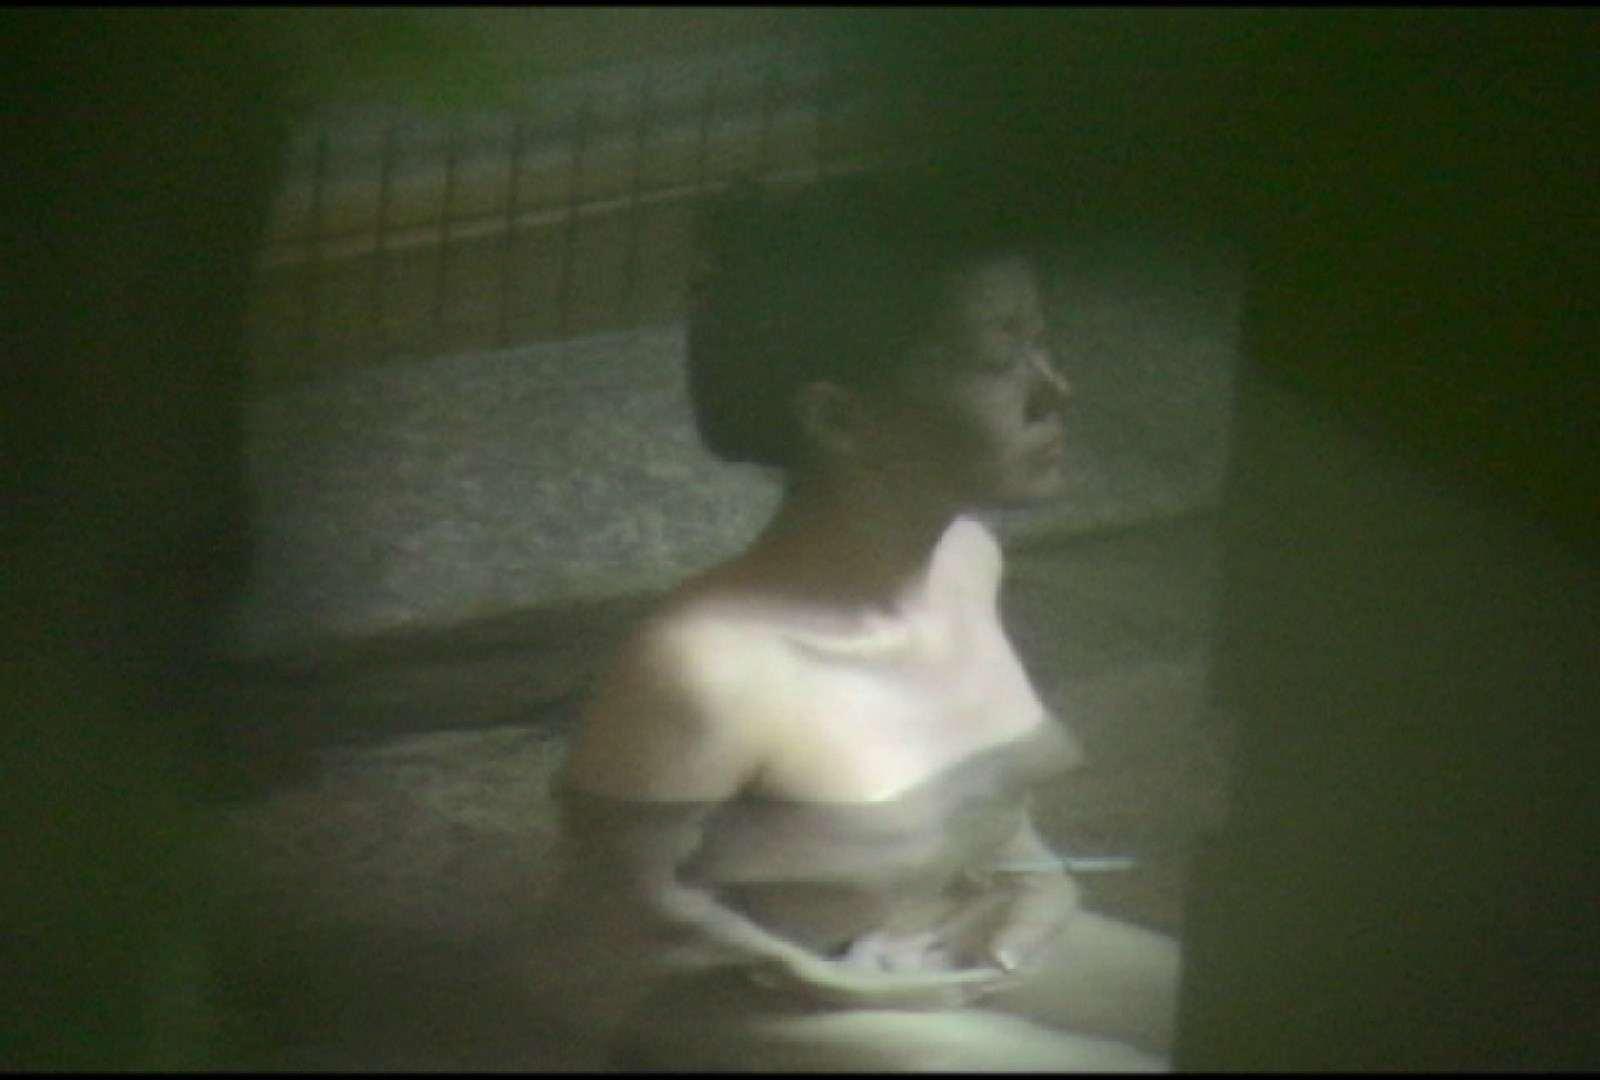 Aquaな露天風呂Vol.699 いやらしいOL セックス画像 91連発 2